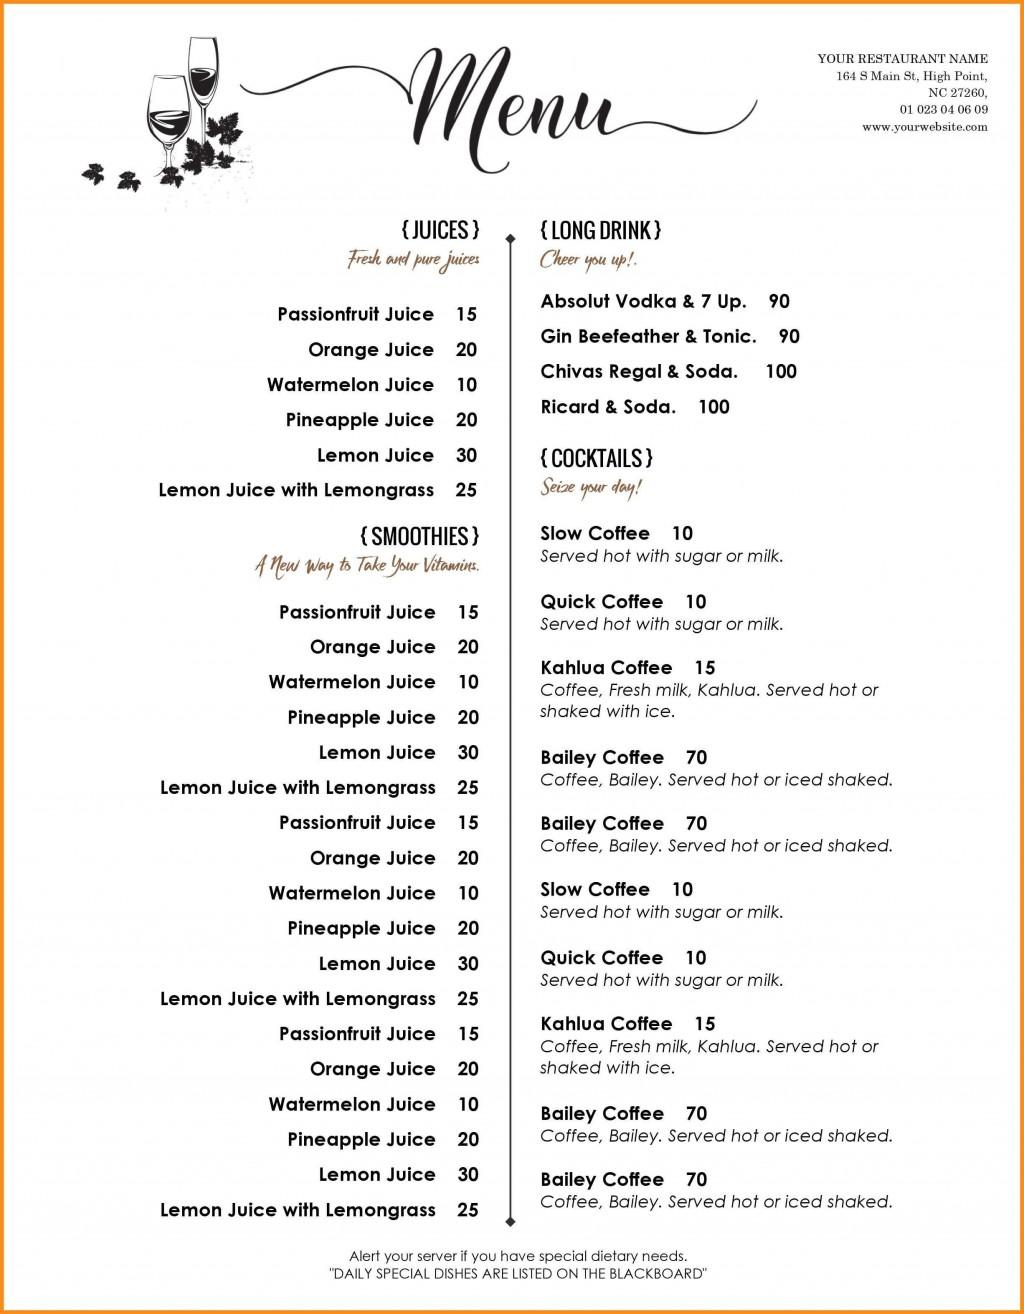 000 Amazing Menu Template Free Download Word High Resolution  Dinner Party WeddingLarge